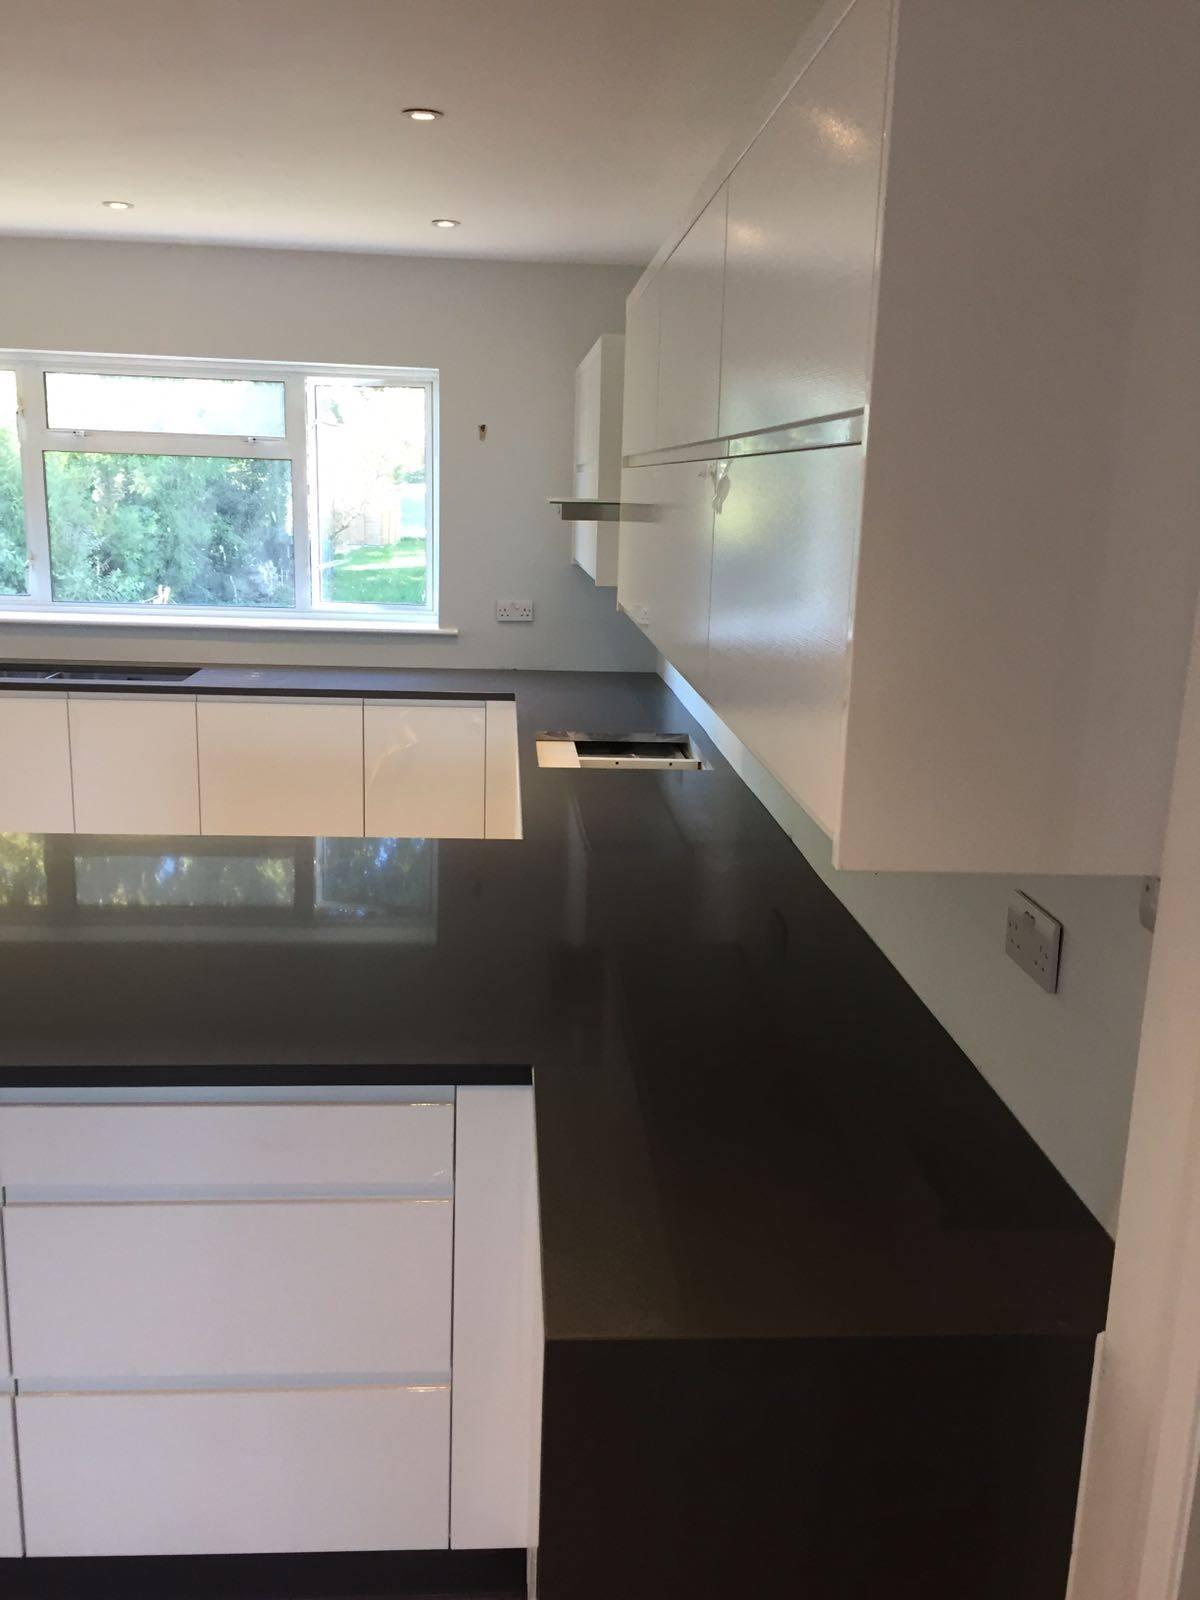 We sell , cut , polish , supply and install granite